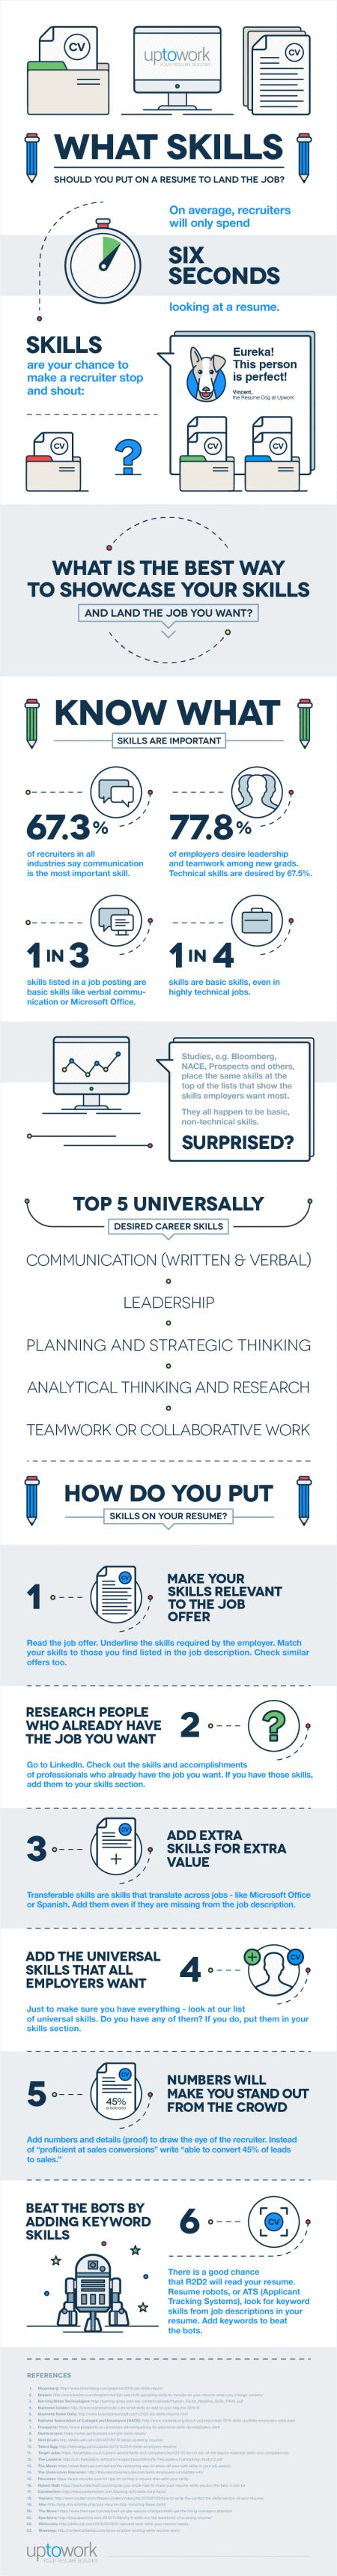 Best My Resume Builder Ideas On Pinterest Resume Builder - Help with a resume